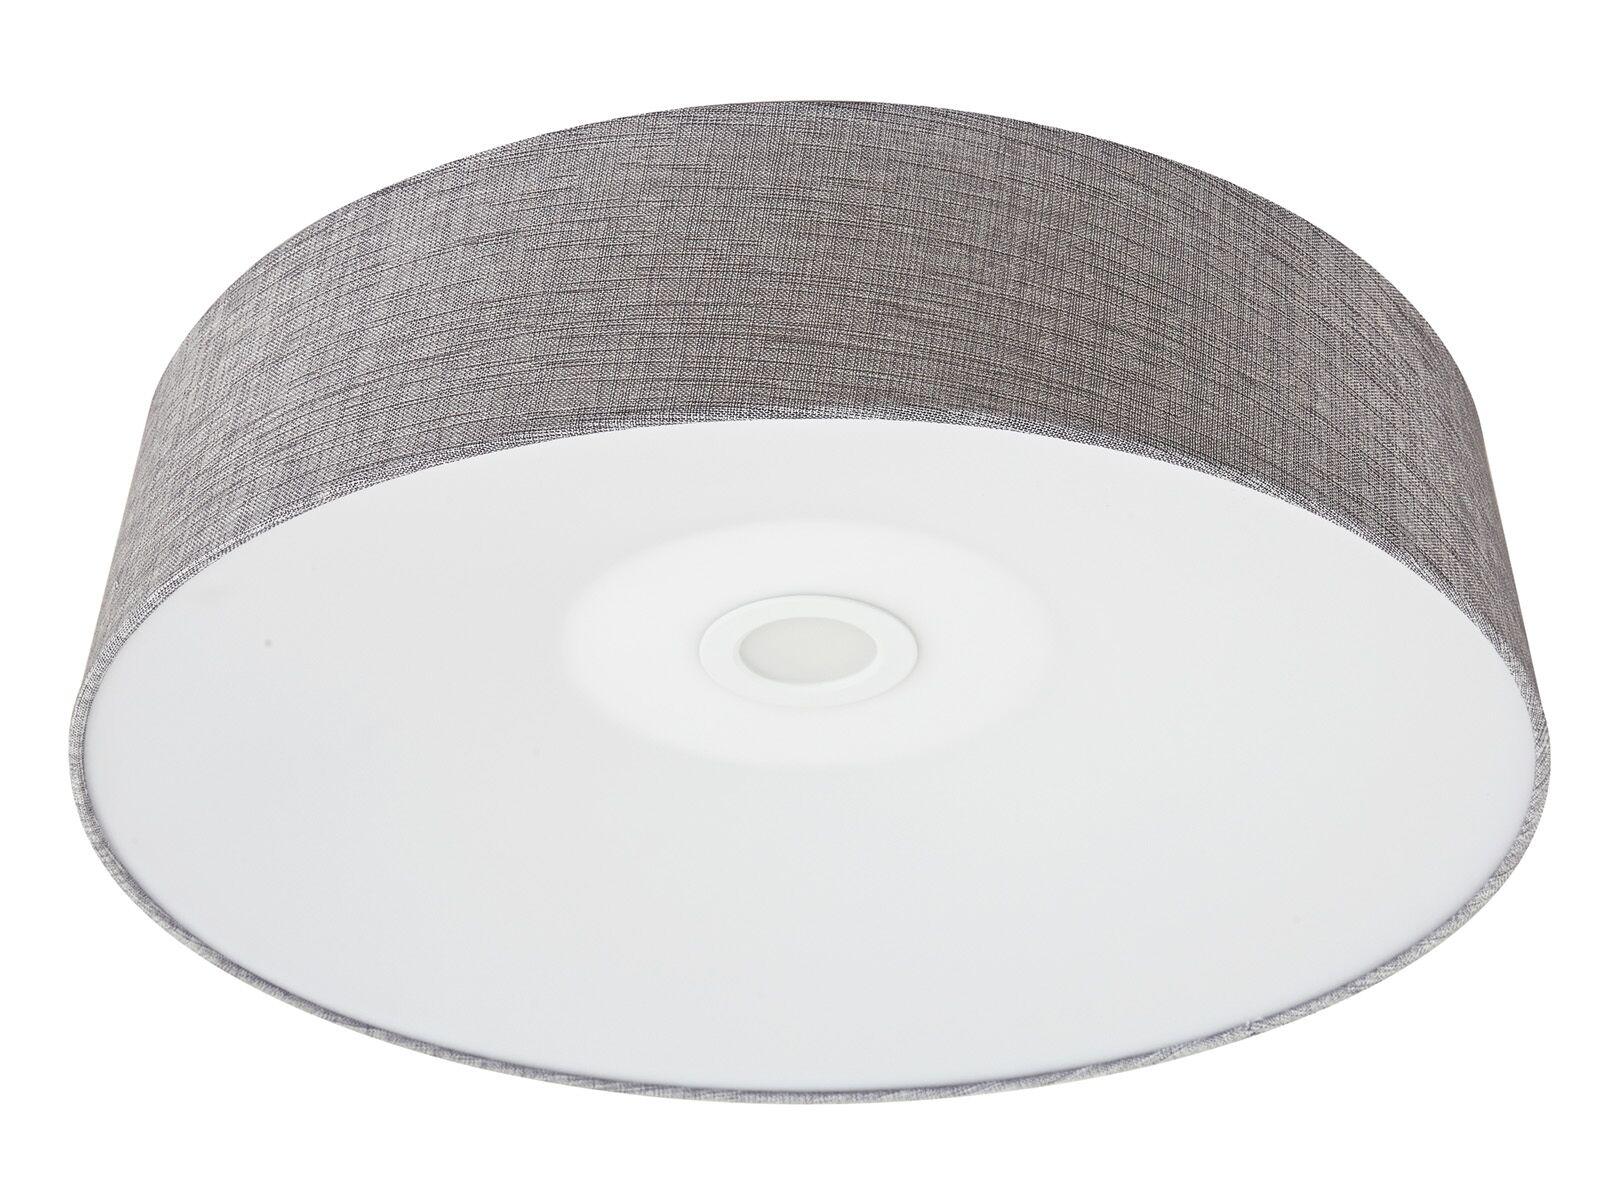 Johnston LED Flush Mount Color: Gray